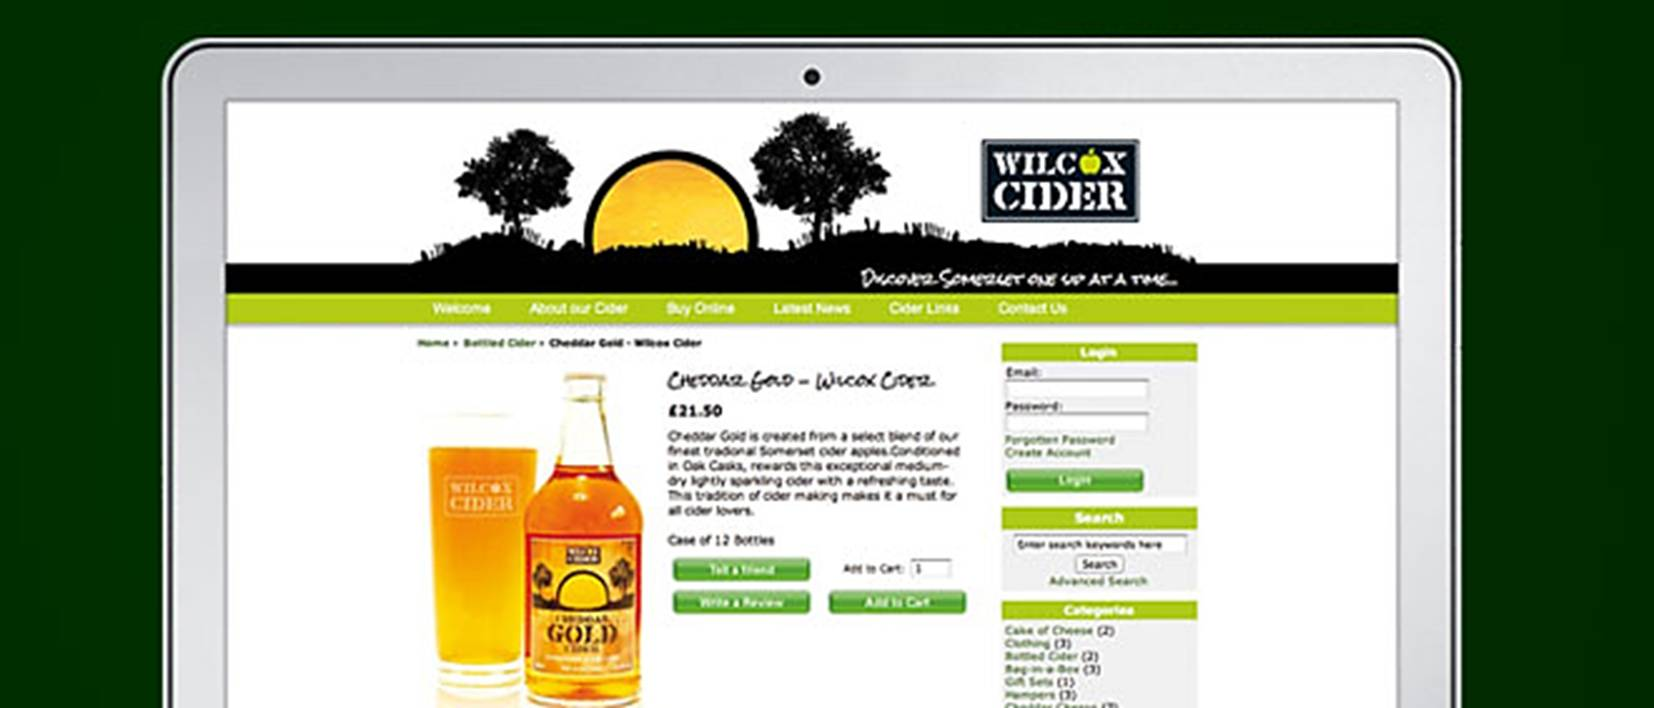 wilcox website banner landscape